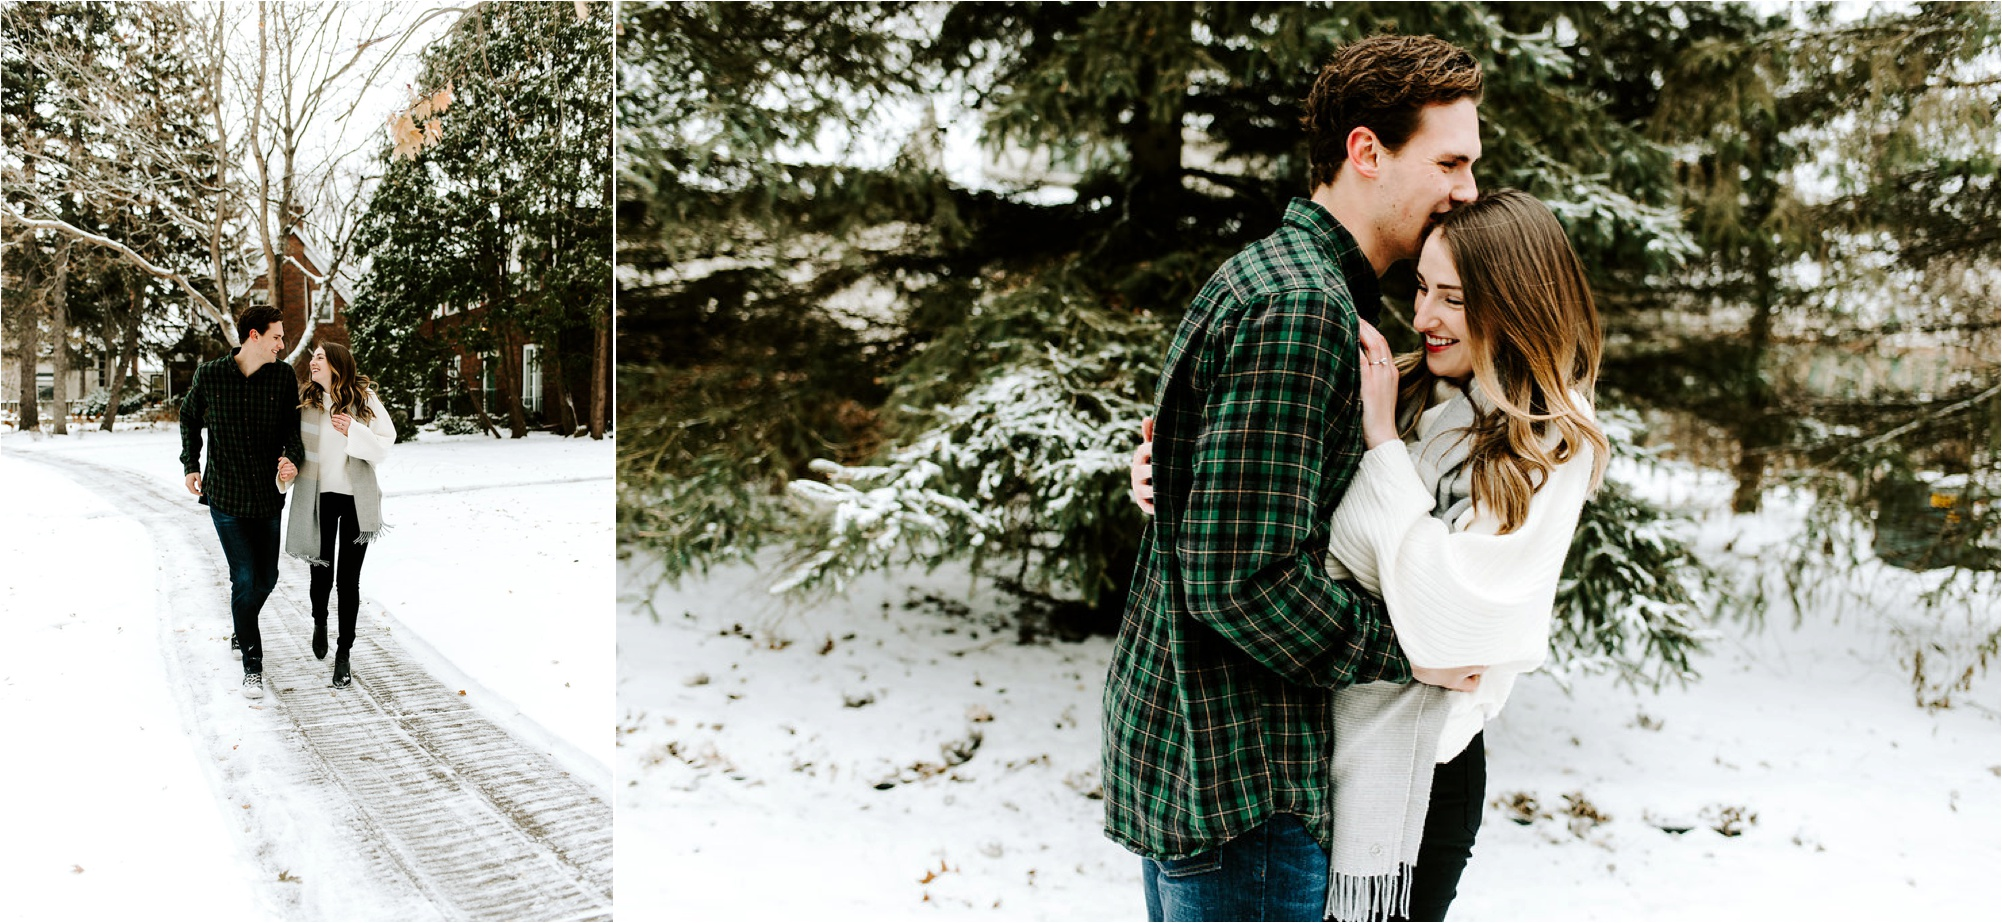 Minnesota Winter Engagement Session